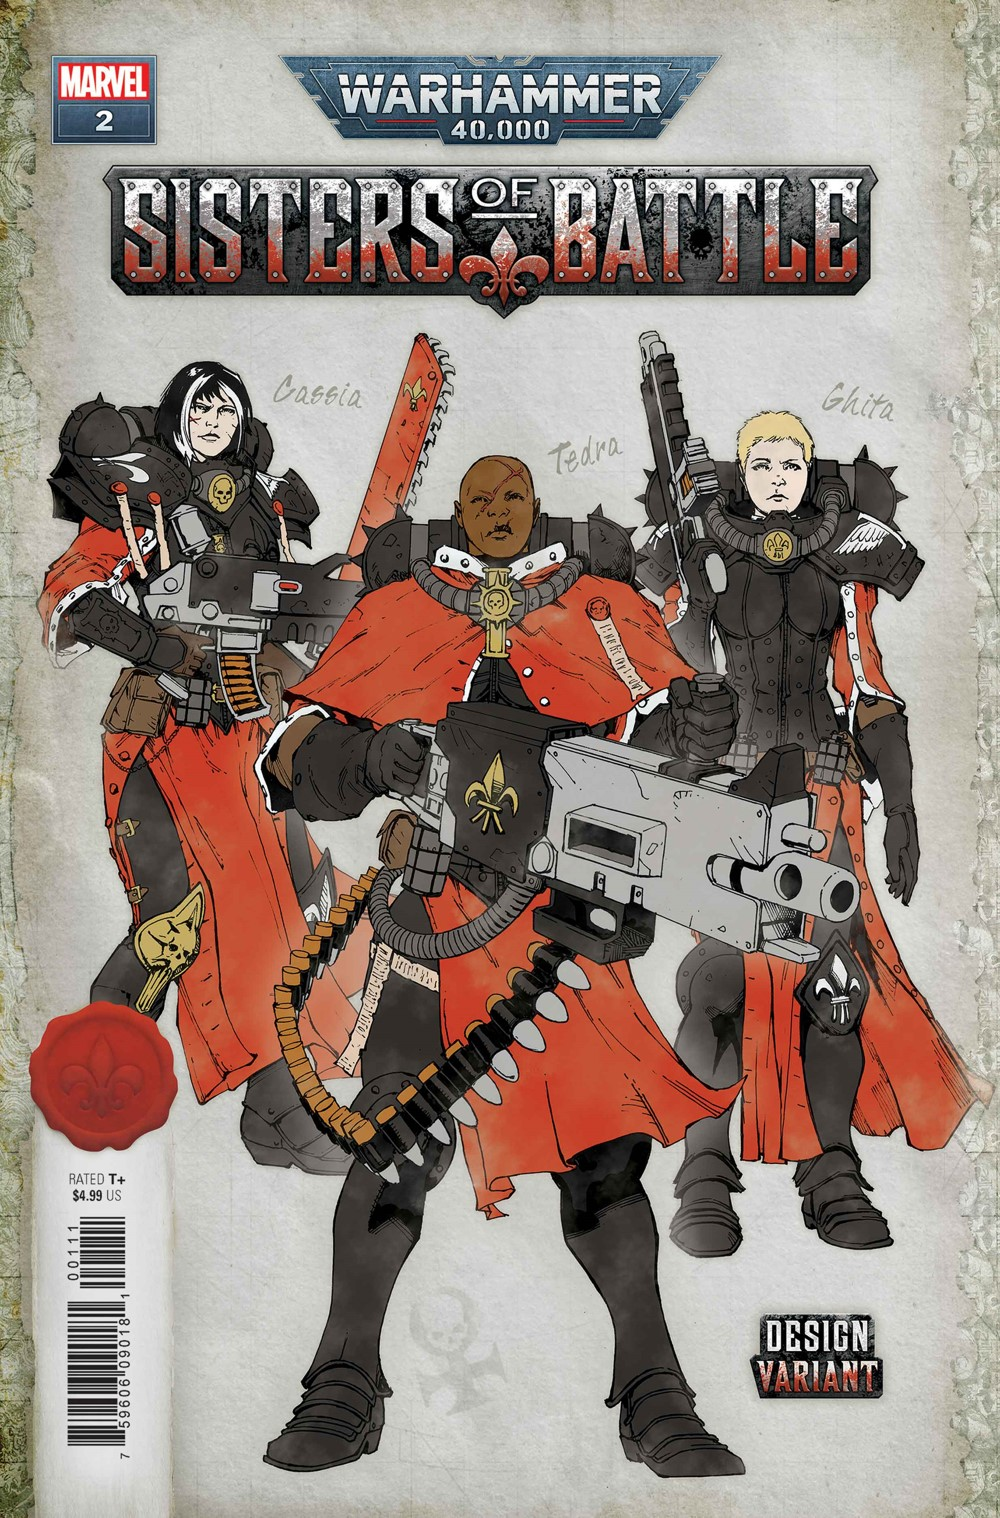 WARHAMMERSOB2021002_design_var Marvel Comics September 2021 Solicitations